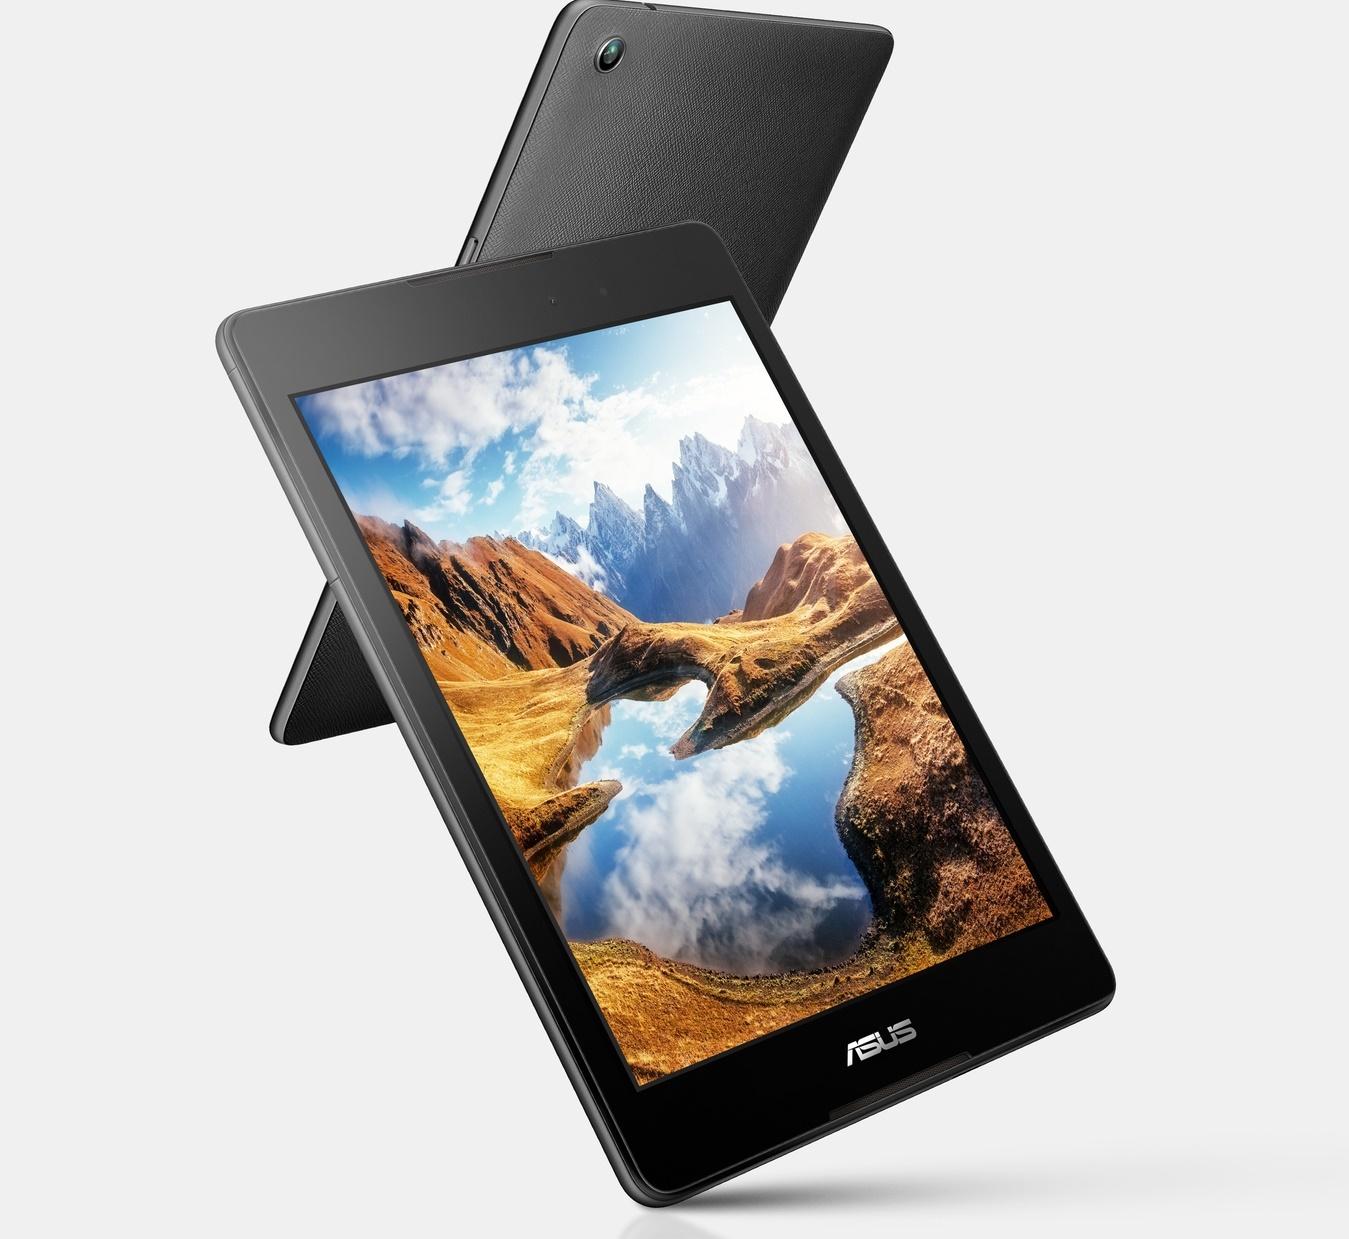 ASUSのSIMフリー8インチタブレット「ASUS ZenPad 3 8.0」発表。Snapdragon 650 ...